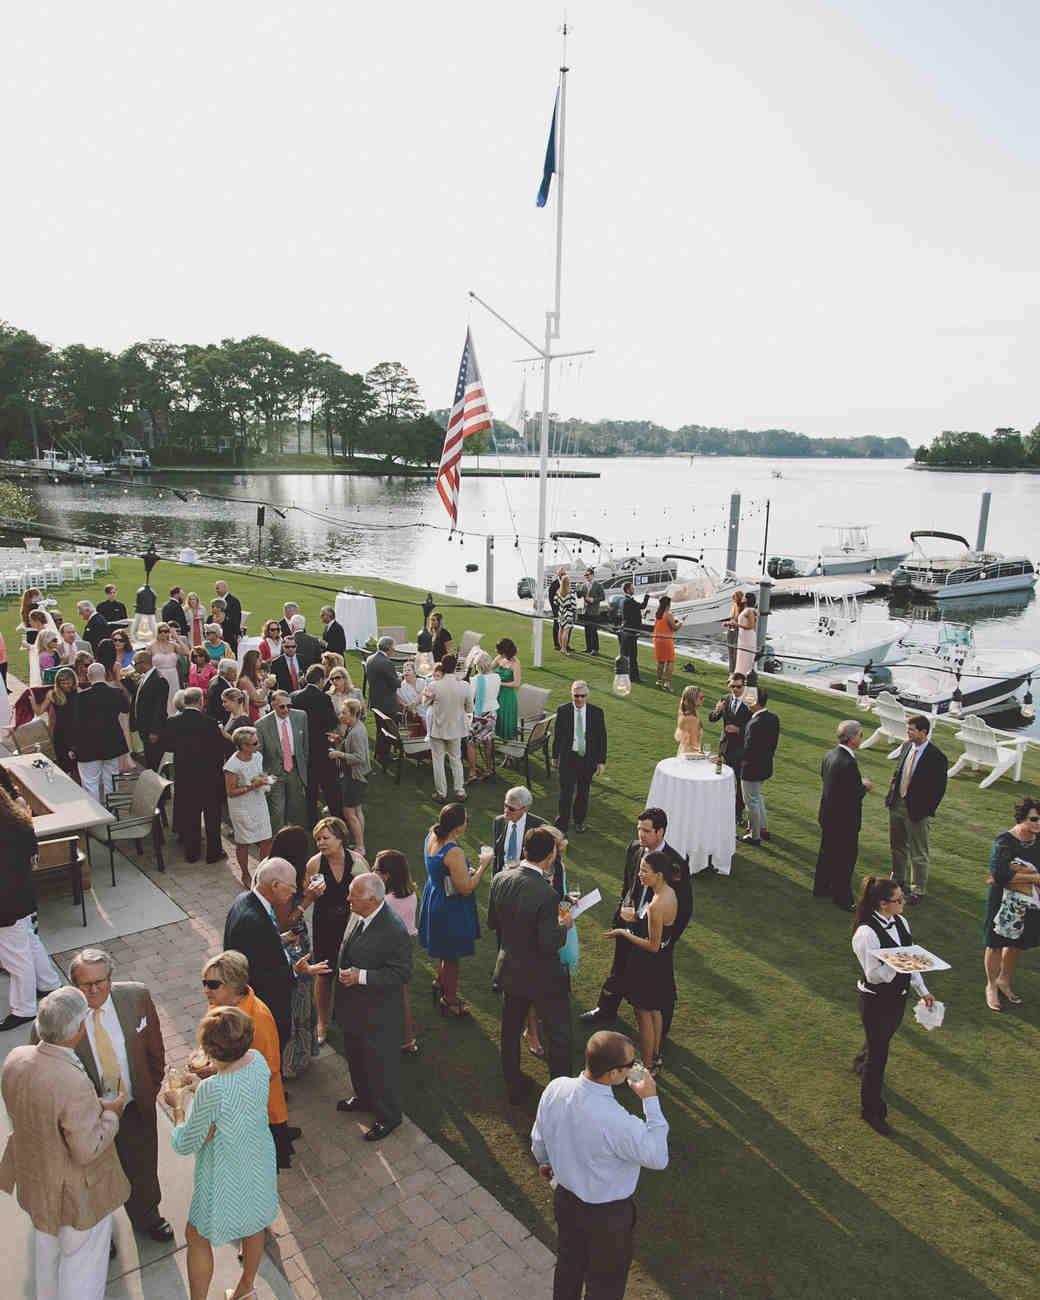 molly-greg-wedding-guests-00070-s111481-0814.jpg